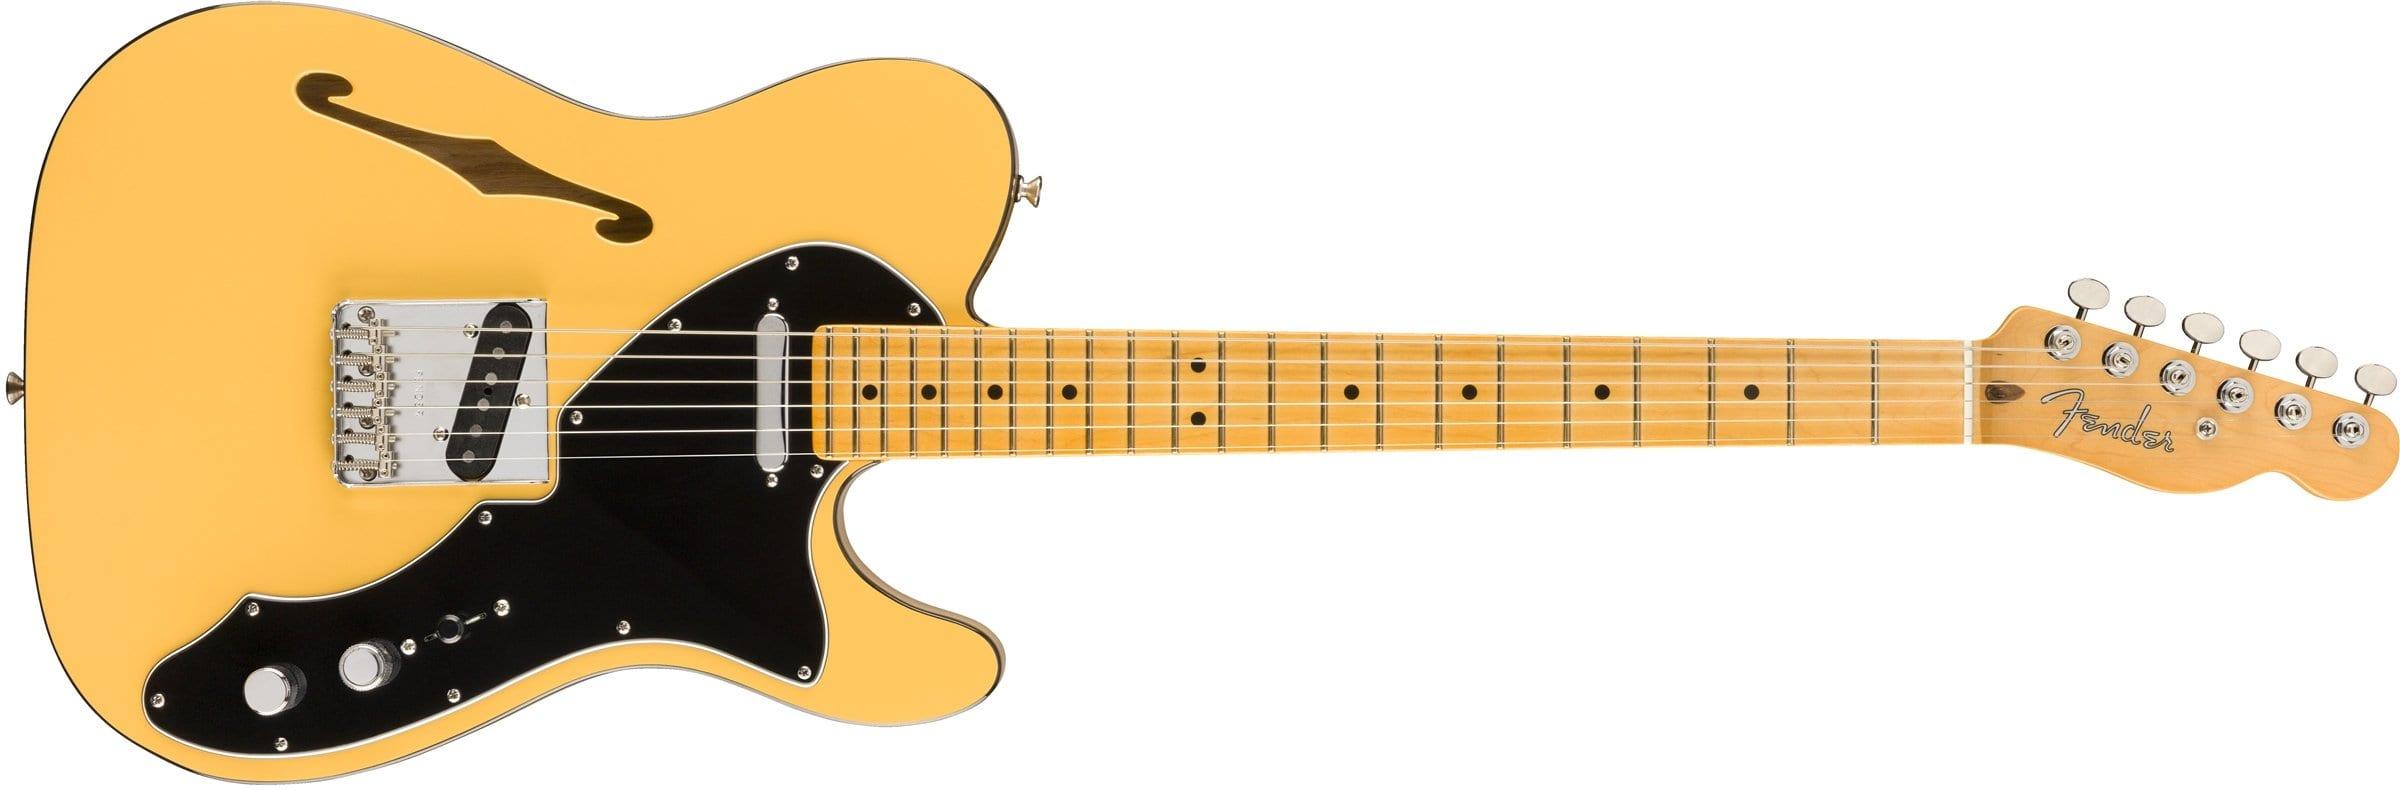 Fender Britt Daniel Tele Thinline